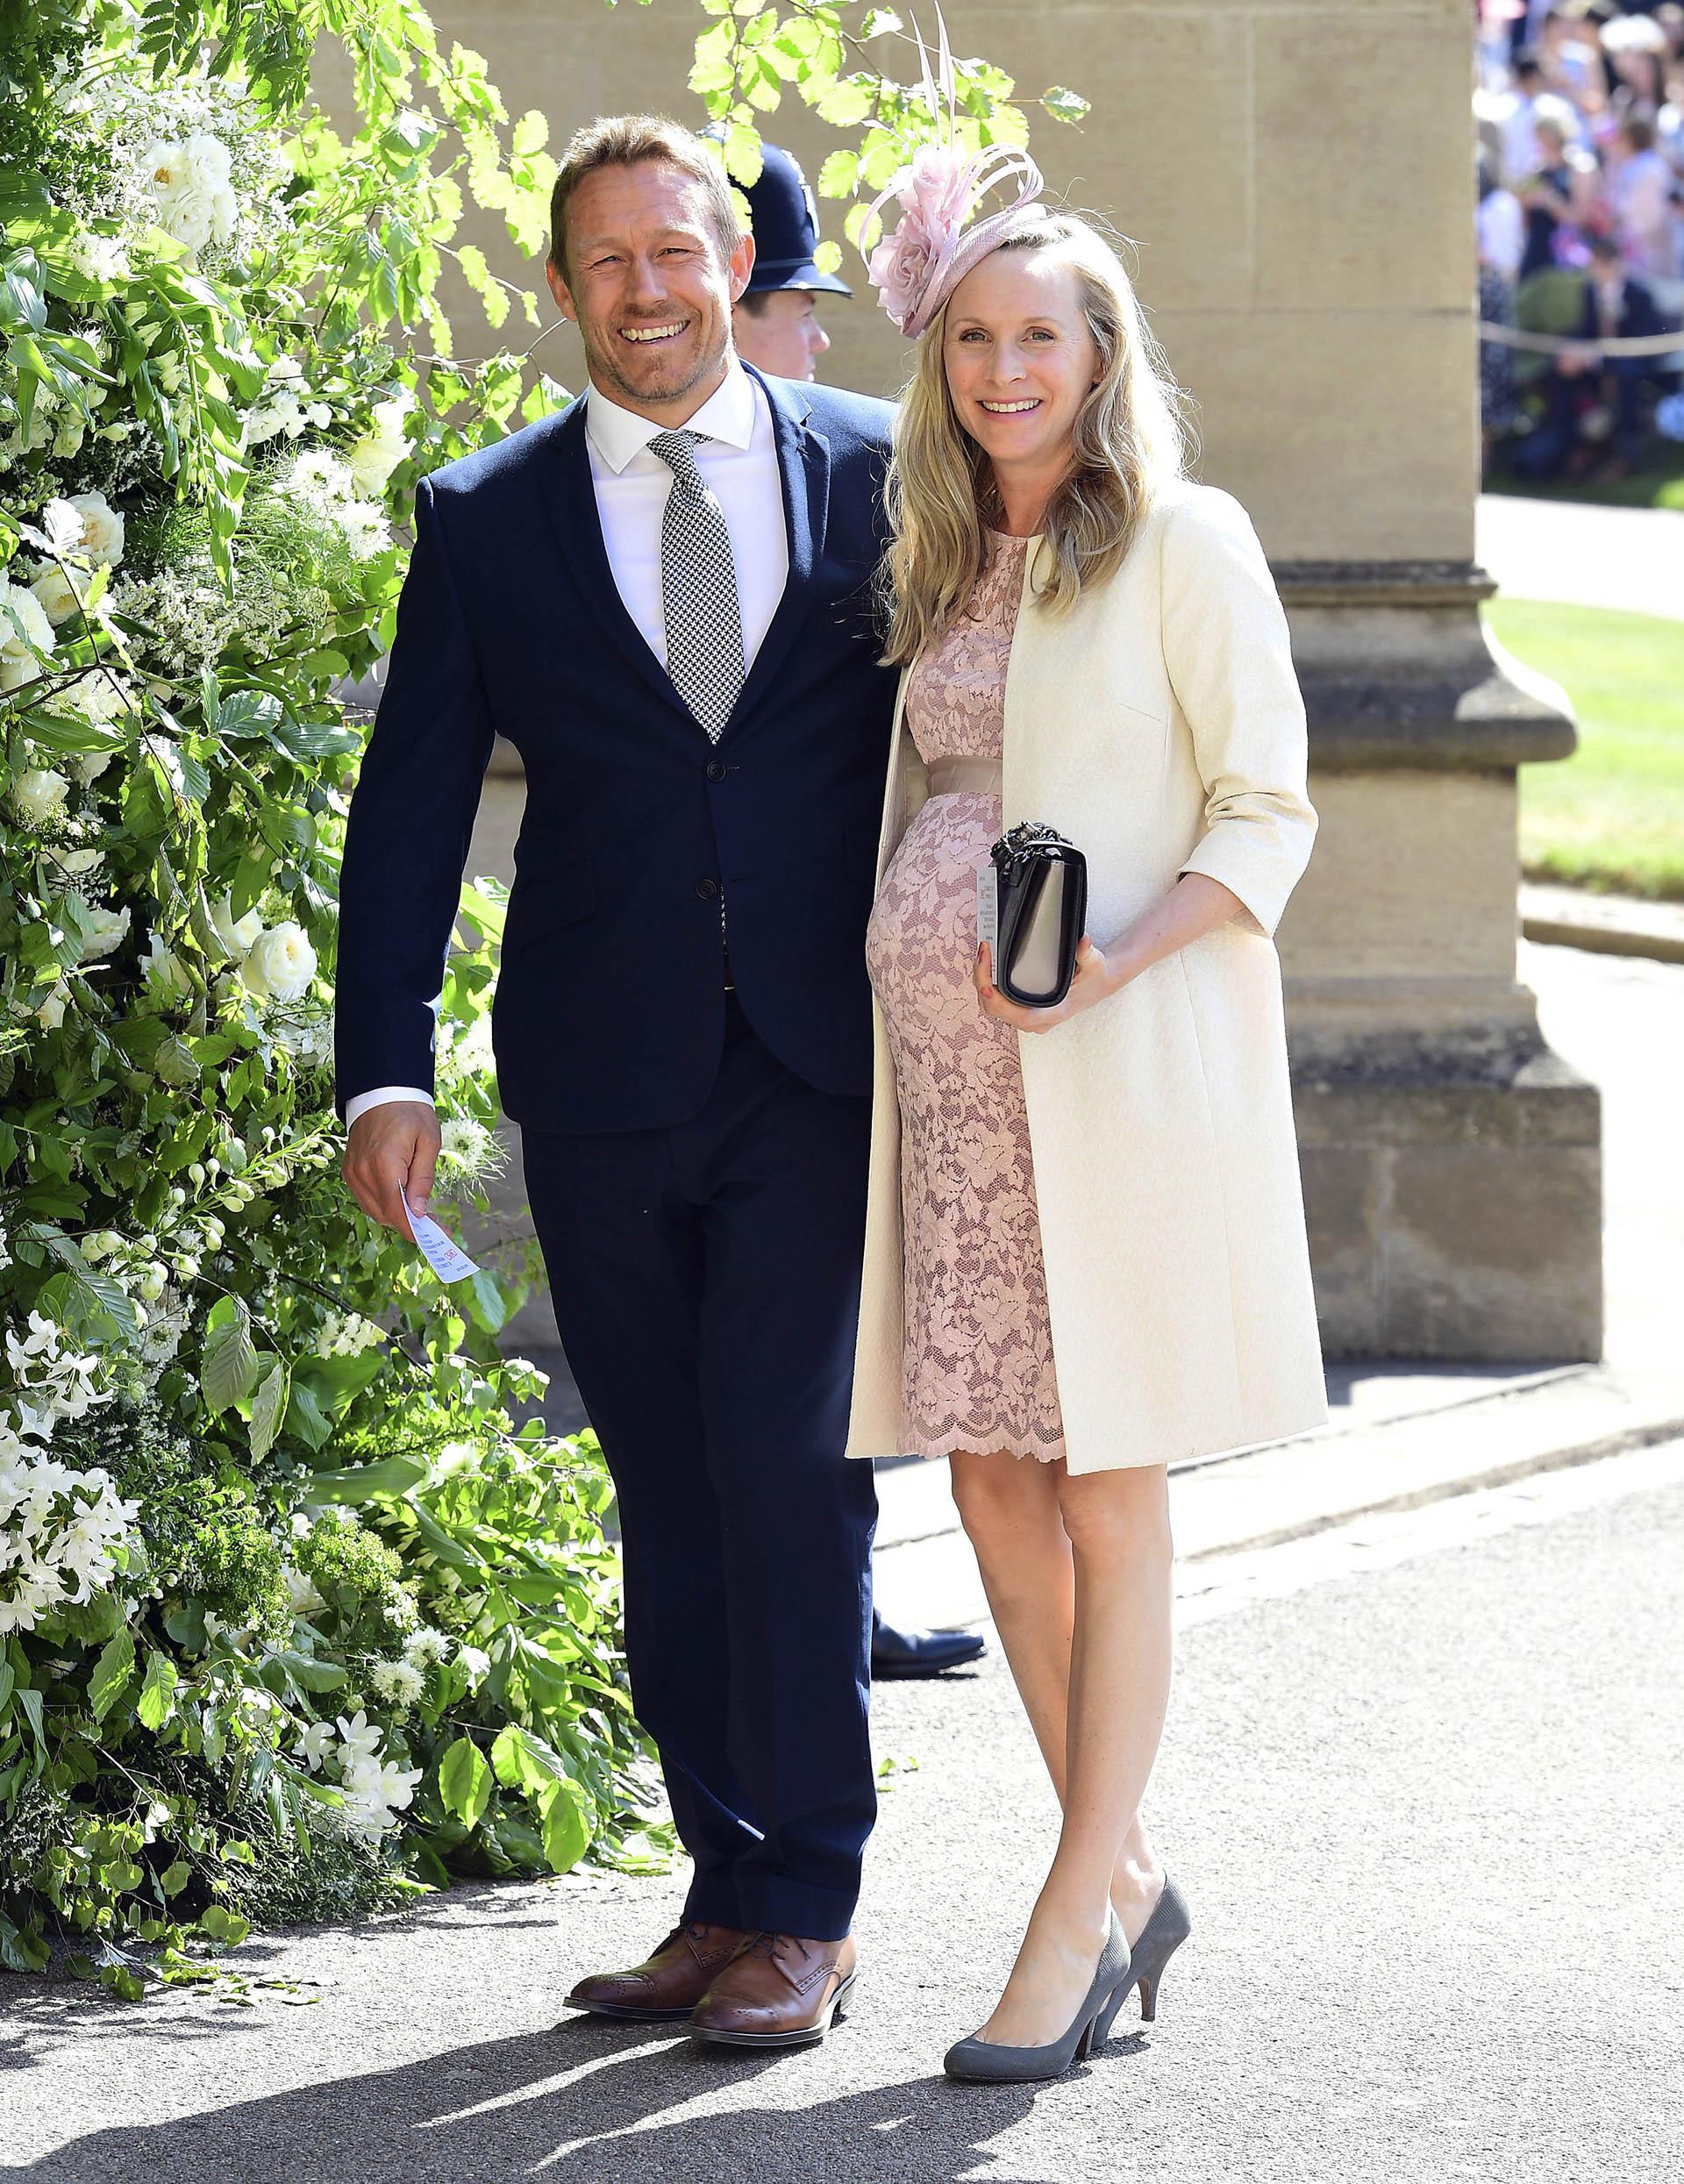 El rugbier Jonny Wilkinson y su pareja Shelley Jenkins (AP)